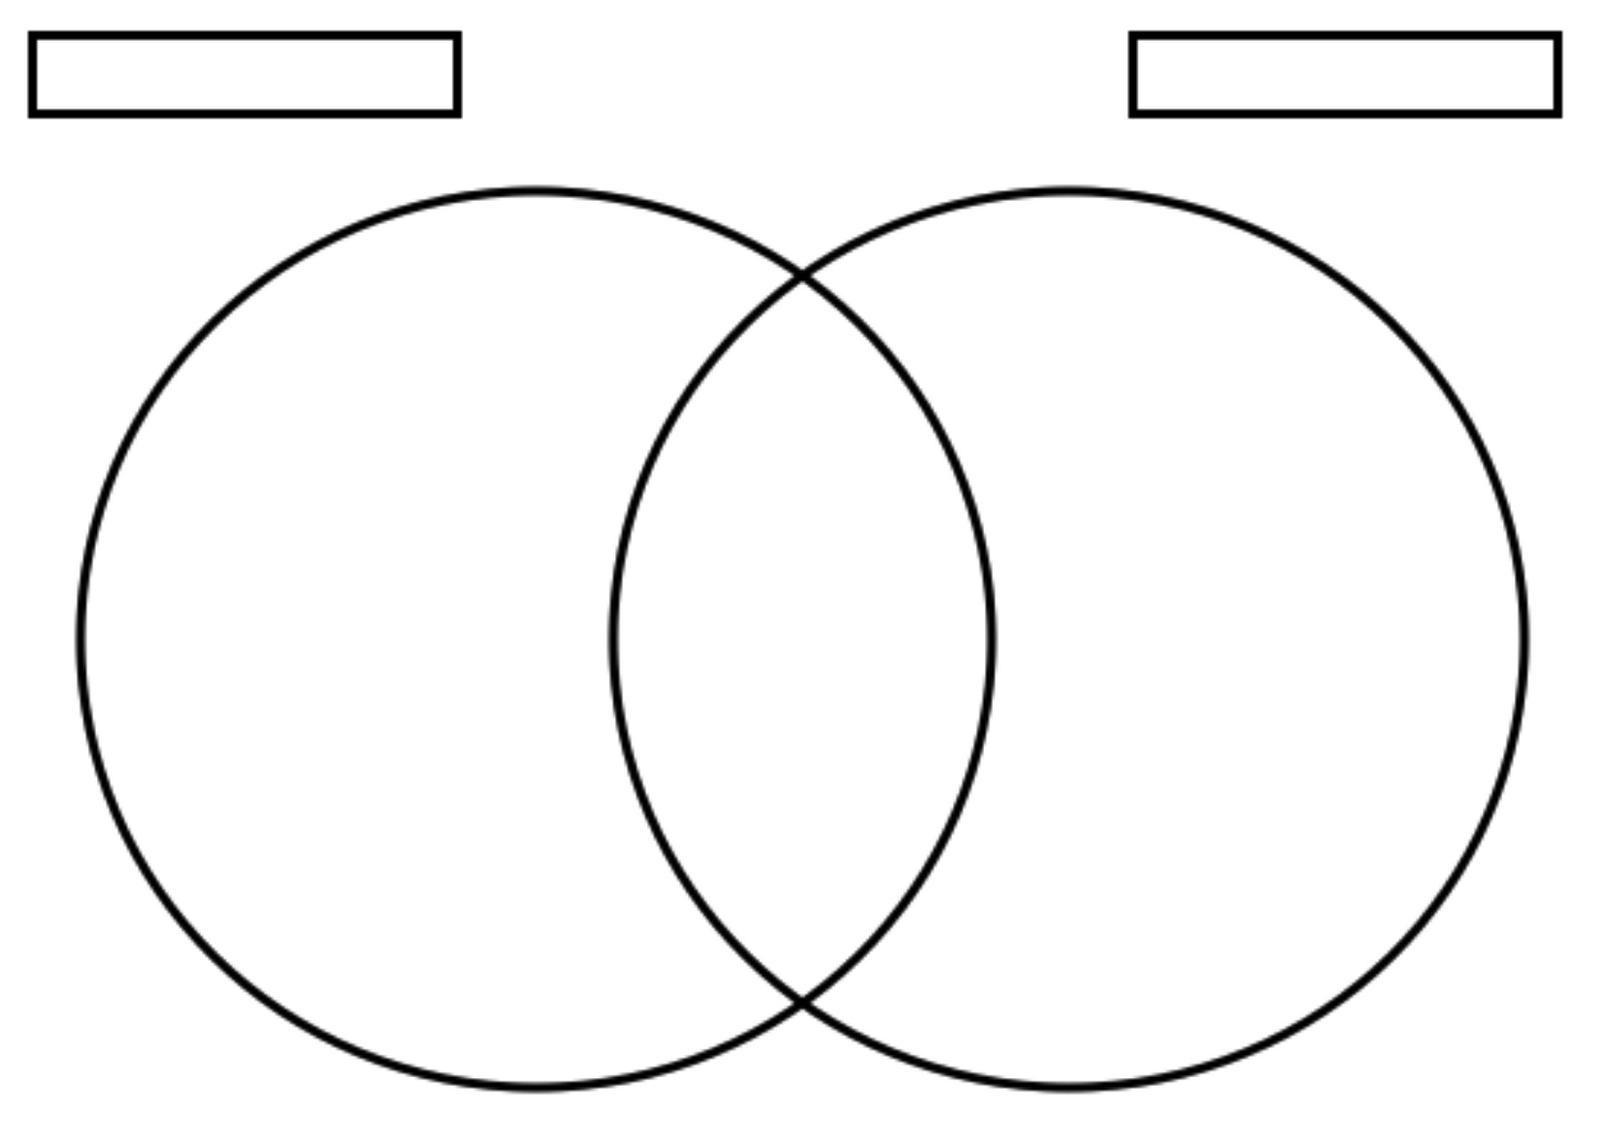 Venn Diagram Template | School Stuff | Venn Diagram Template, Venn - Free Printable Venn Diagram